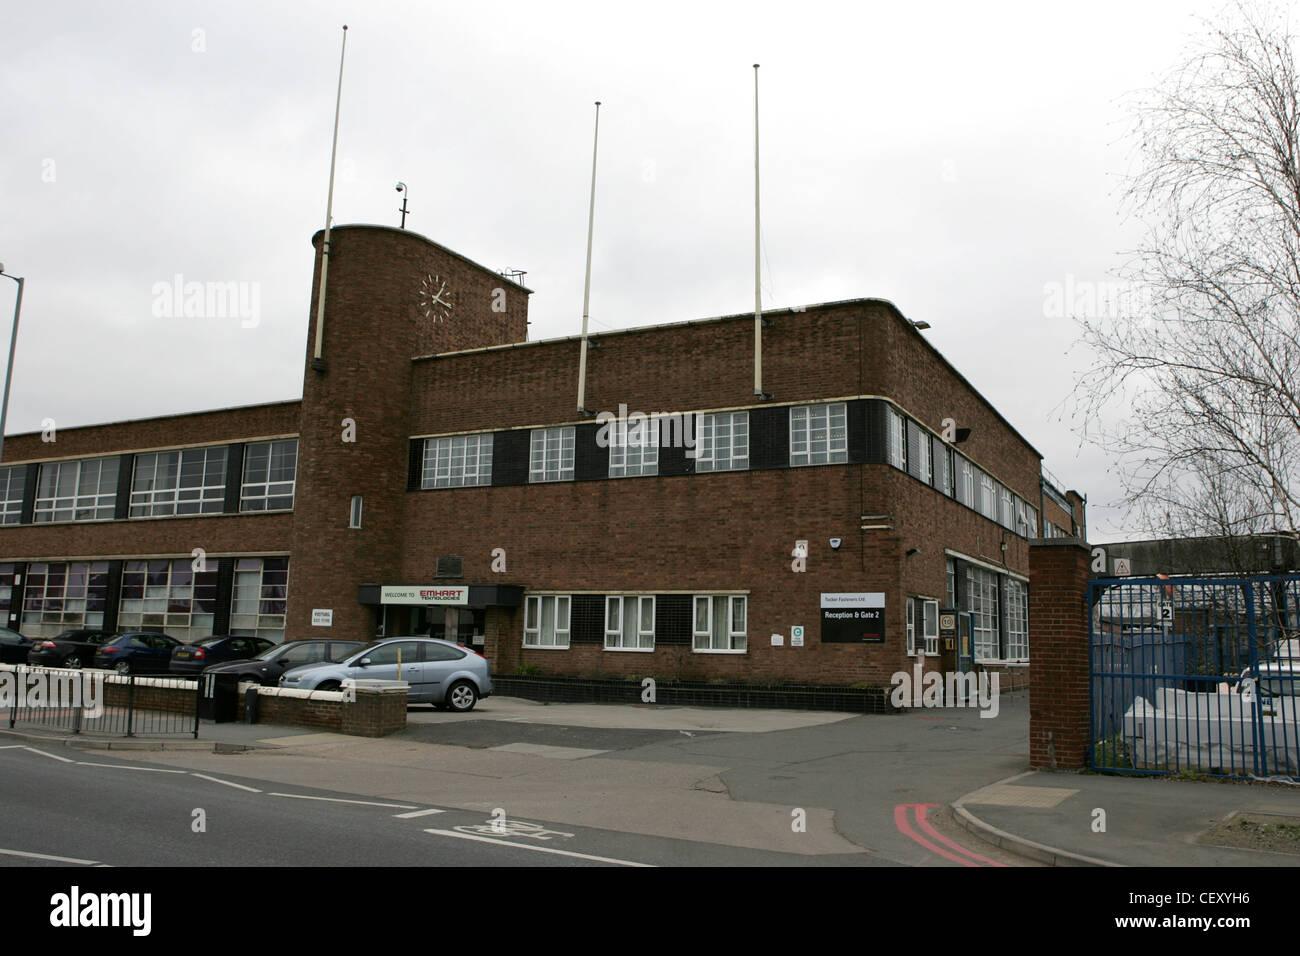 emhart technologies, tucker fasteners factory, birmingham feb 2012 Stock Photo